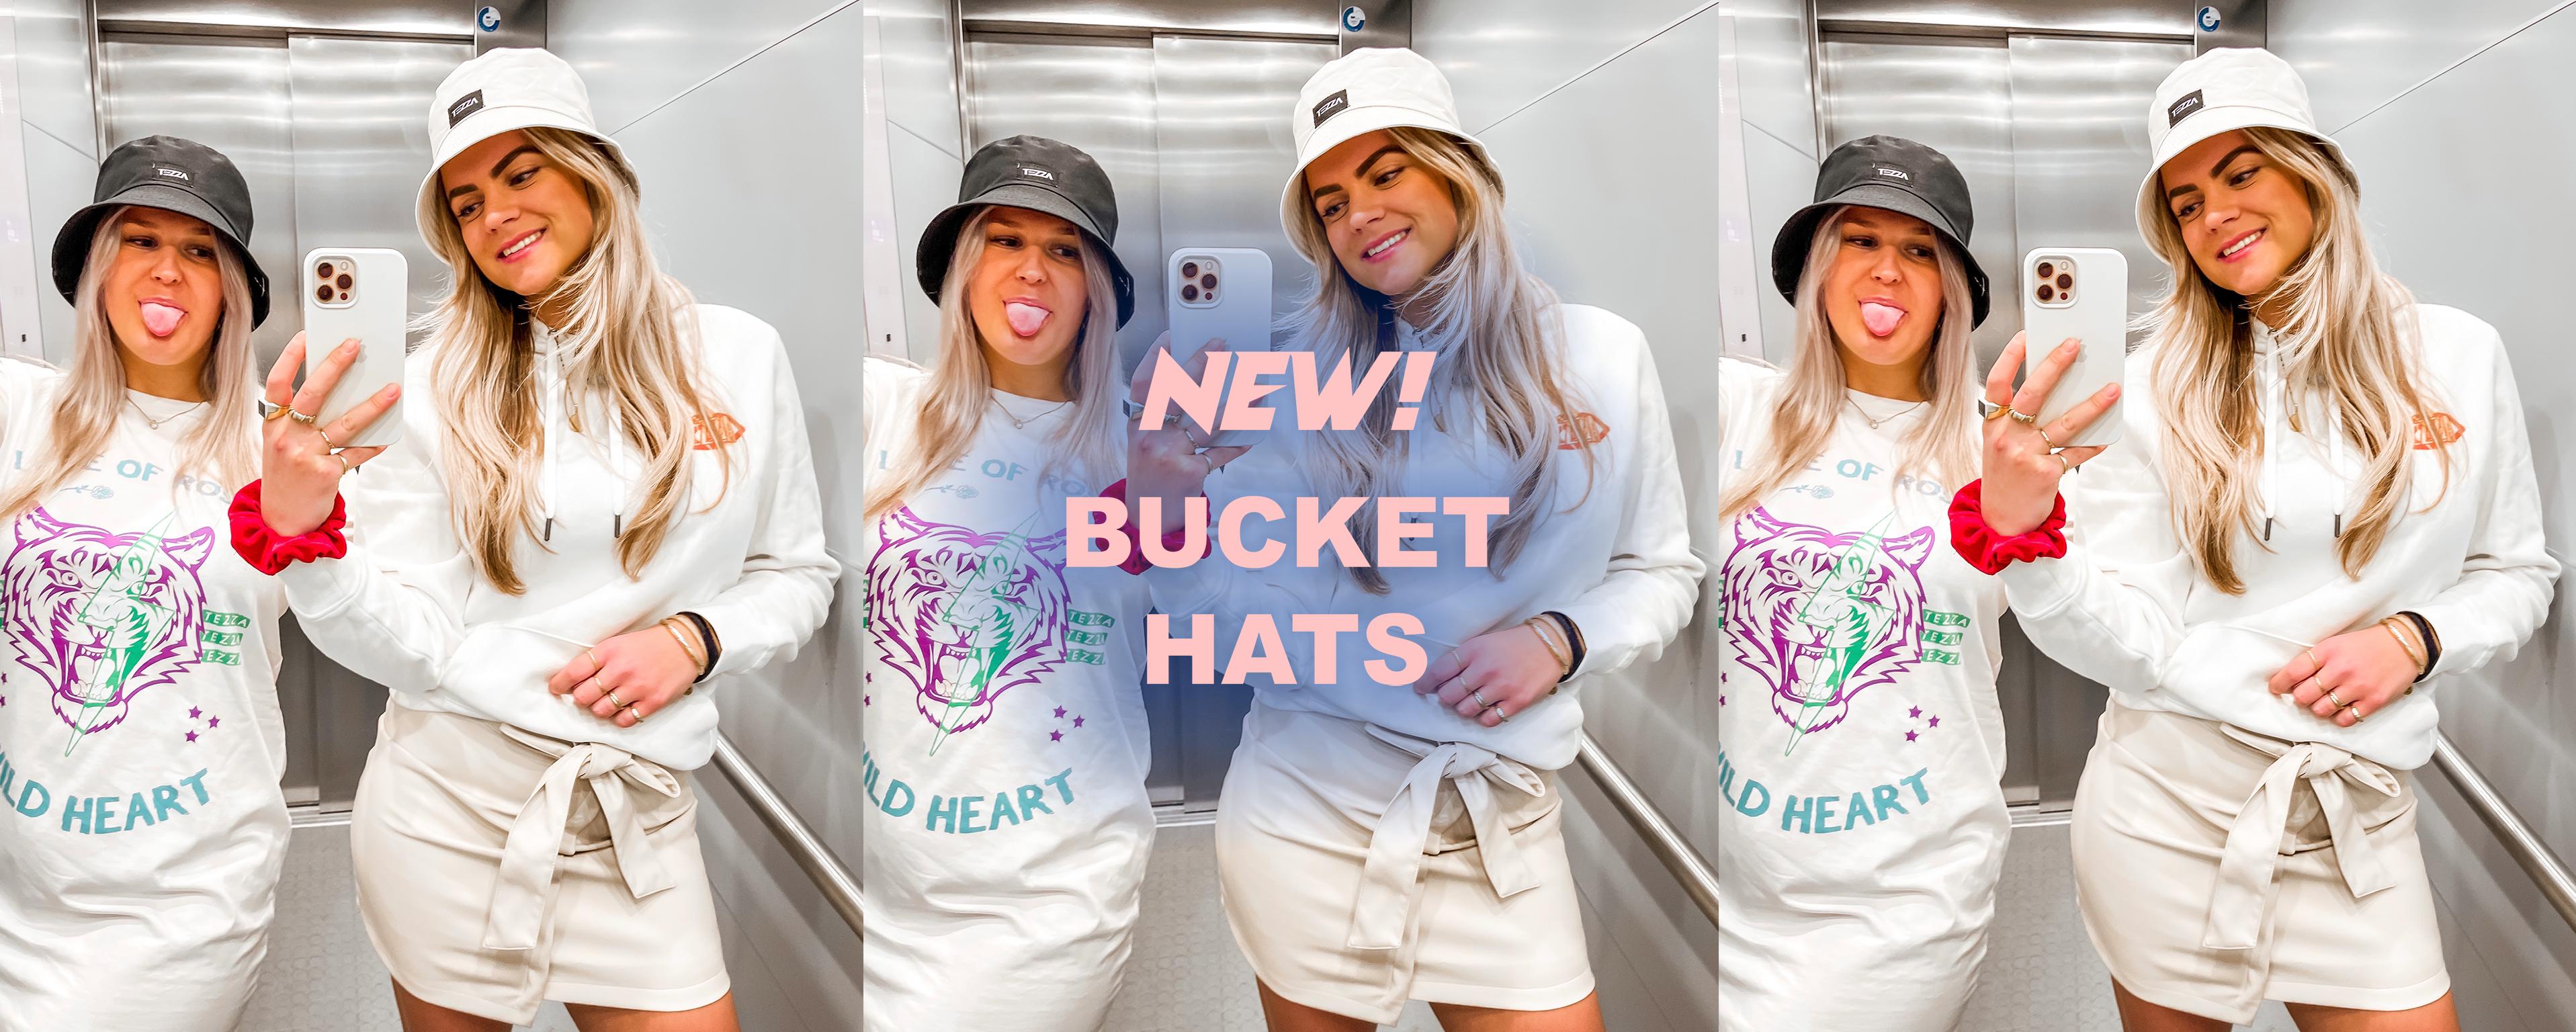 Bucket hats Tezza Fashion